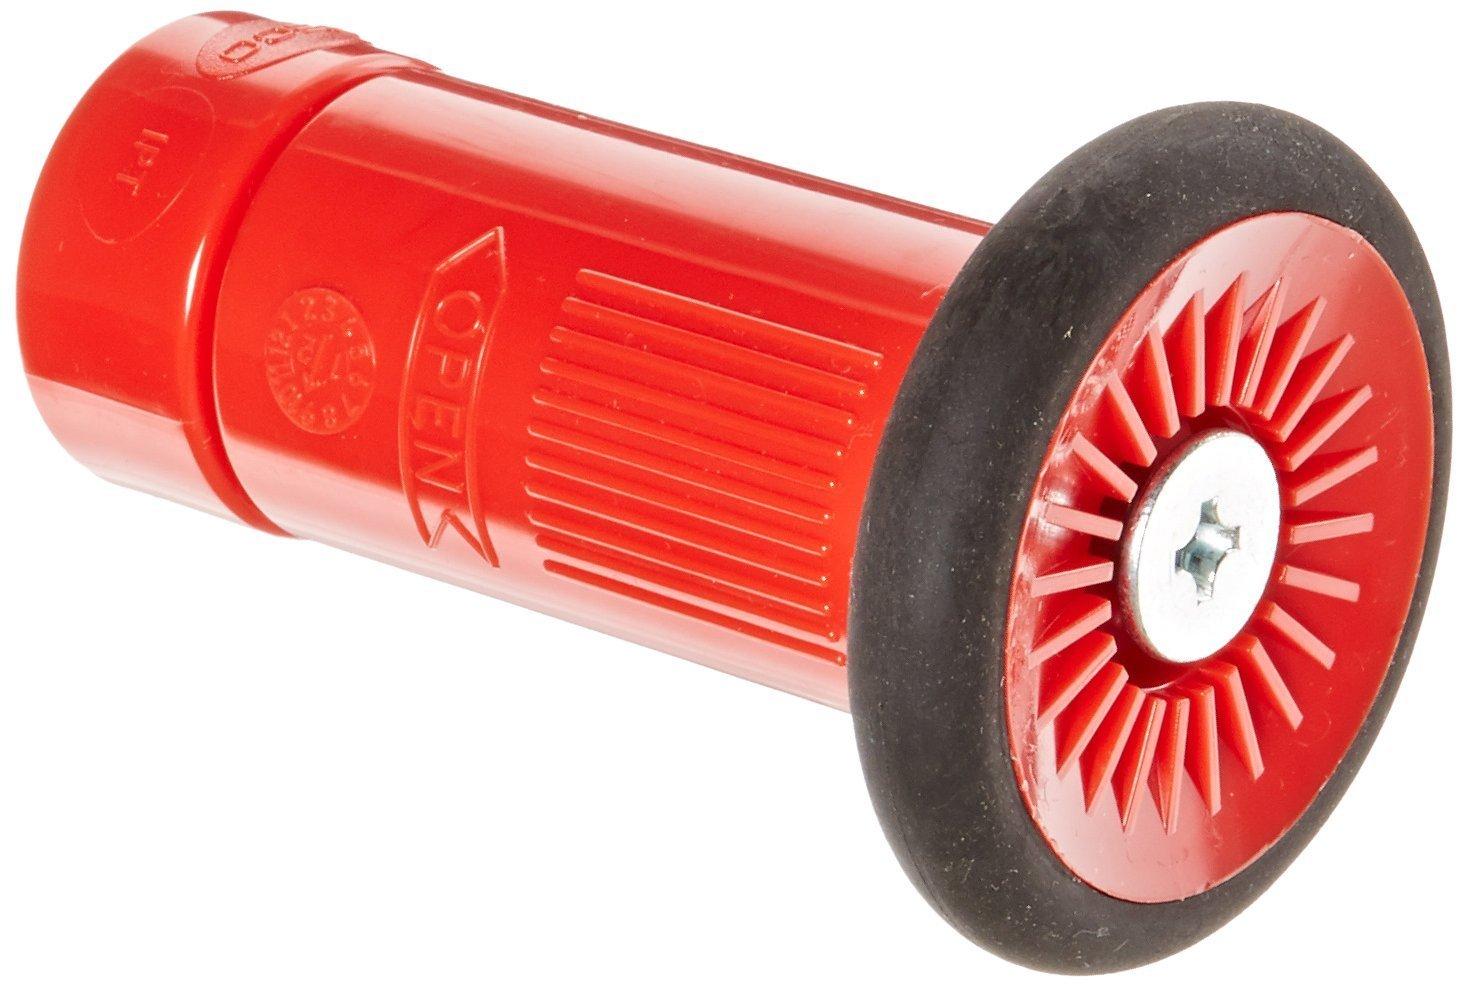 Dixon Valve HGB100S Polycarbonate Fire Equipment, Thermoplastic Fog Nozzle with Bumper, 1'' NPS